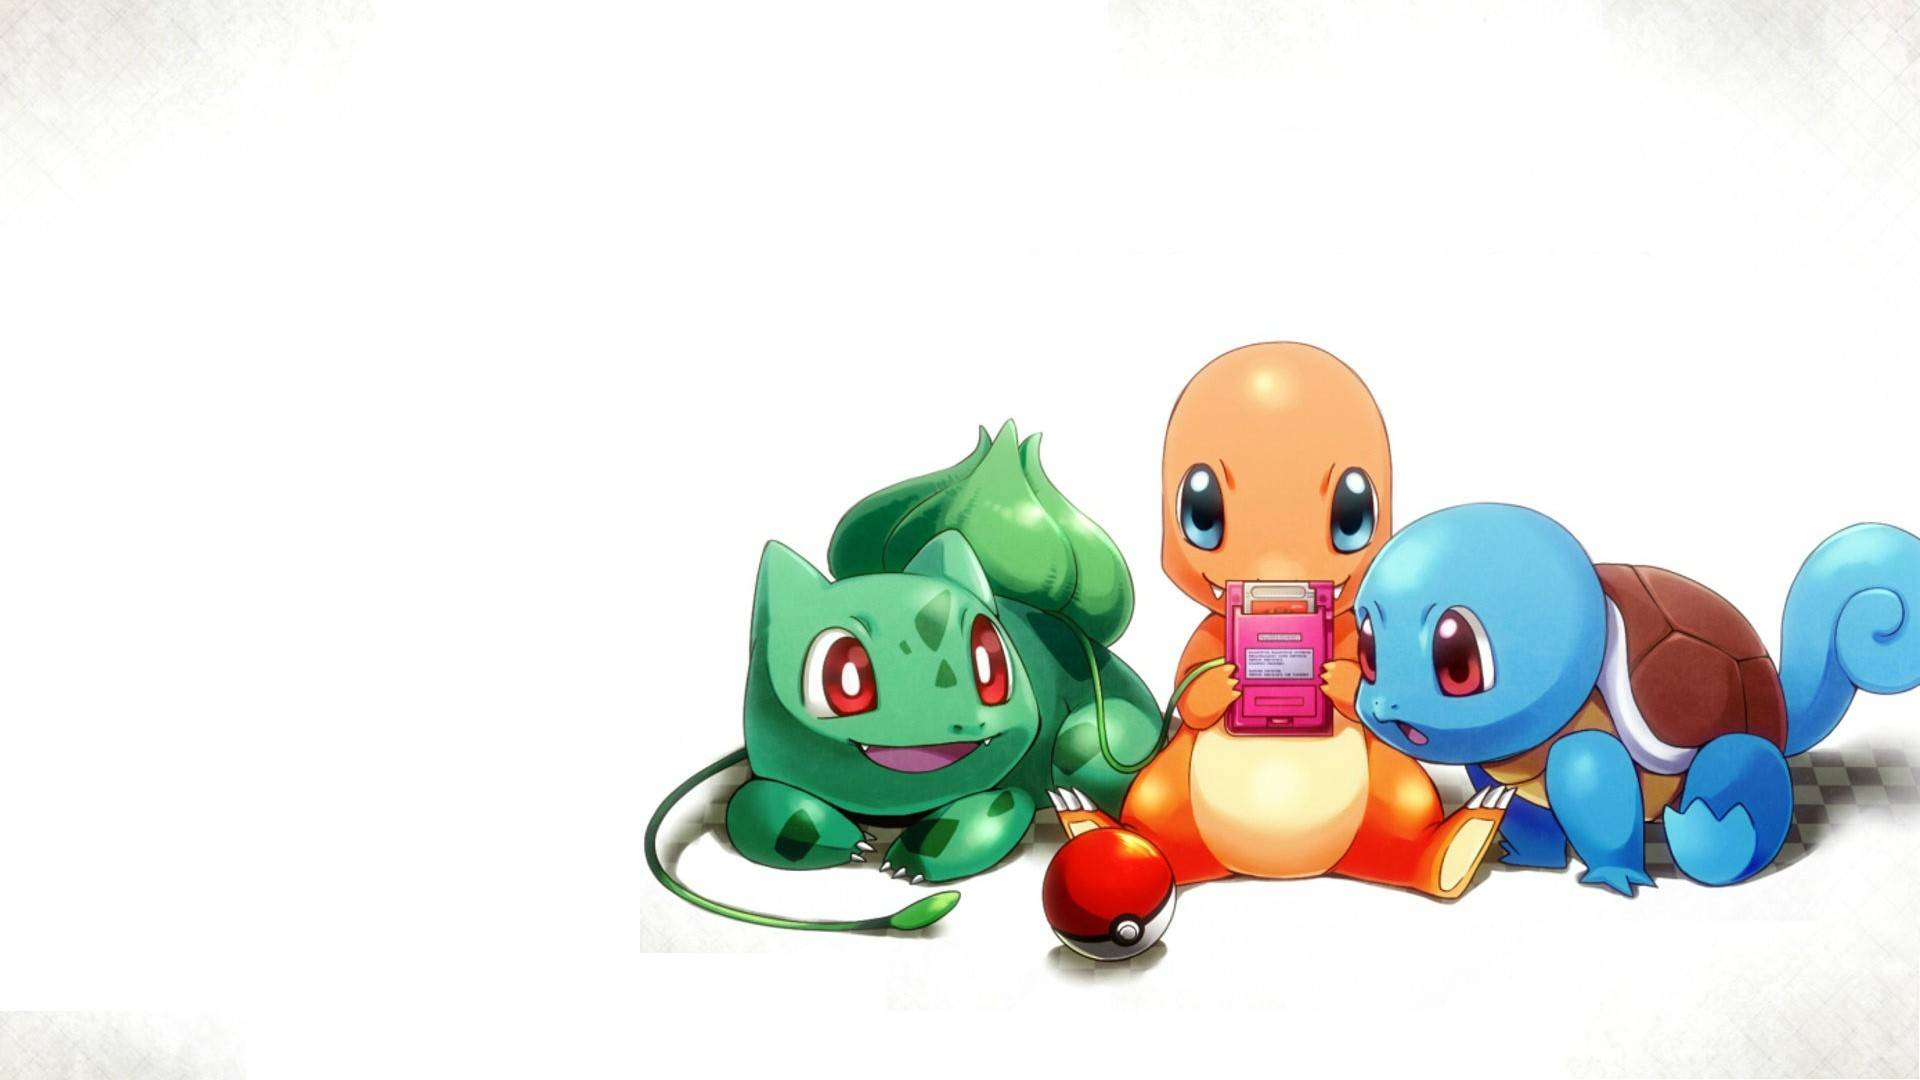 pokemon cool hd wallpapers Desktop Backgrounds for HD Wallpaper 1920x1080